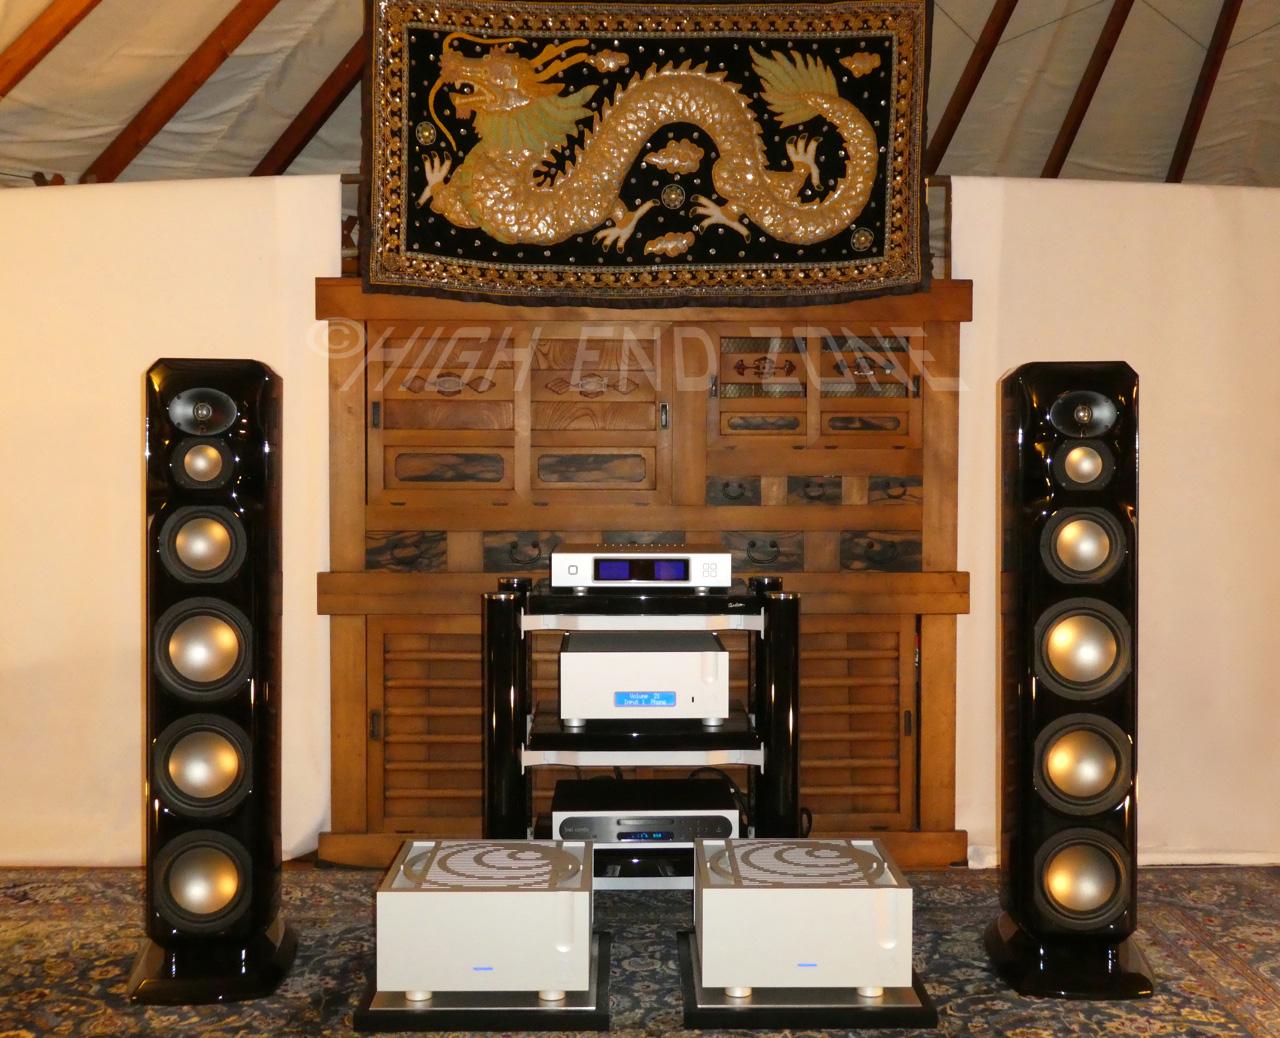 601 series ii direct reflecting speakers moreover 2 ohm speaker rh skincareuse pw